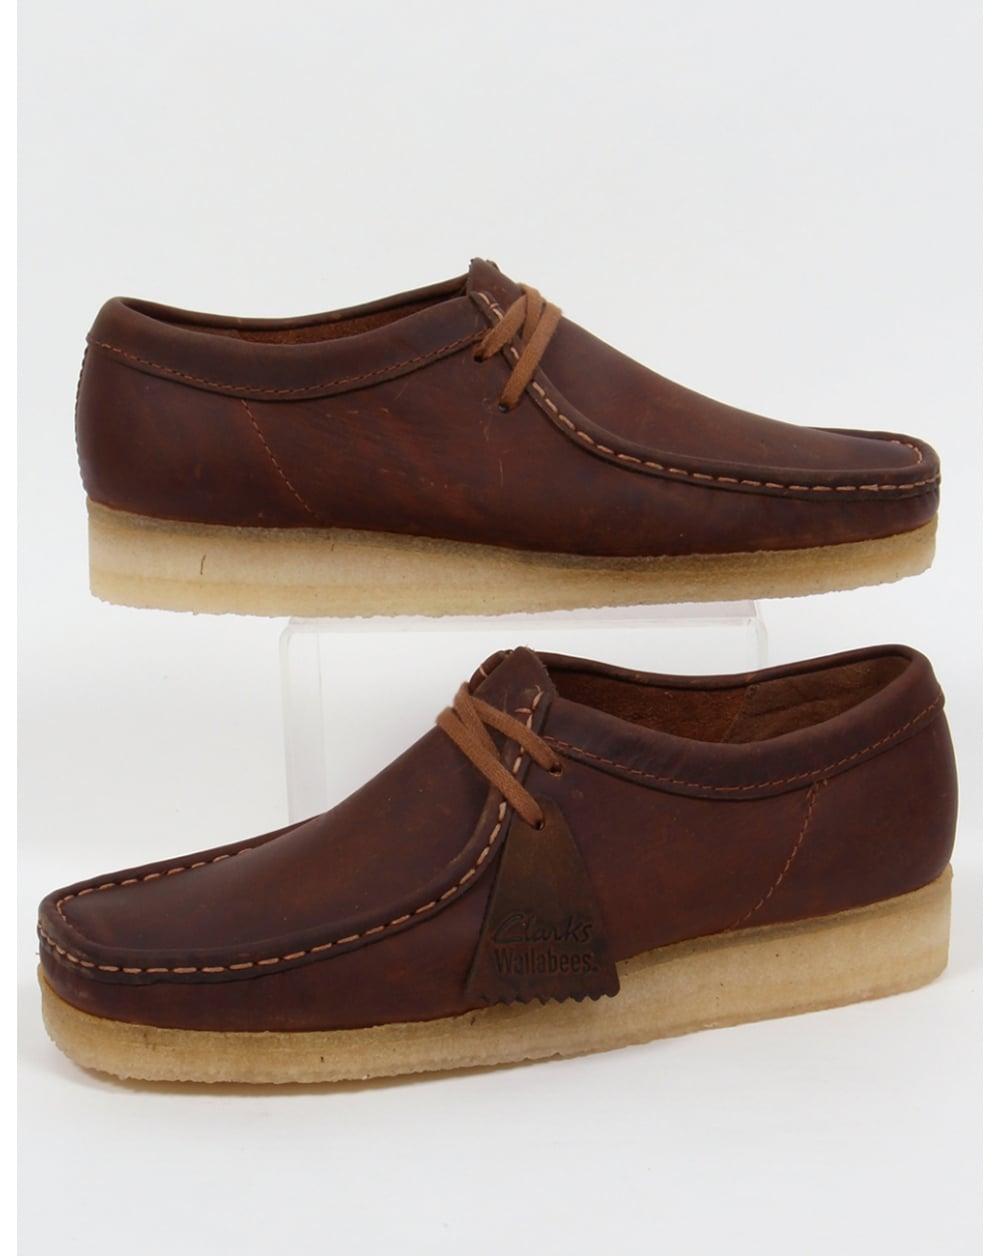 Clarks Originals Wallabee Shoes Beeswax